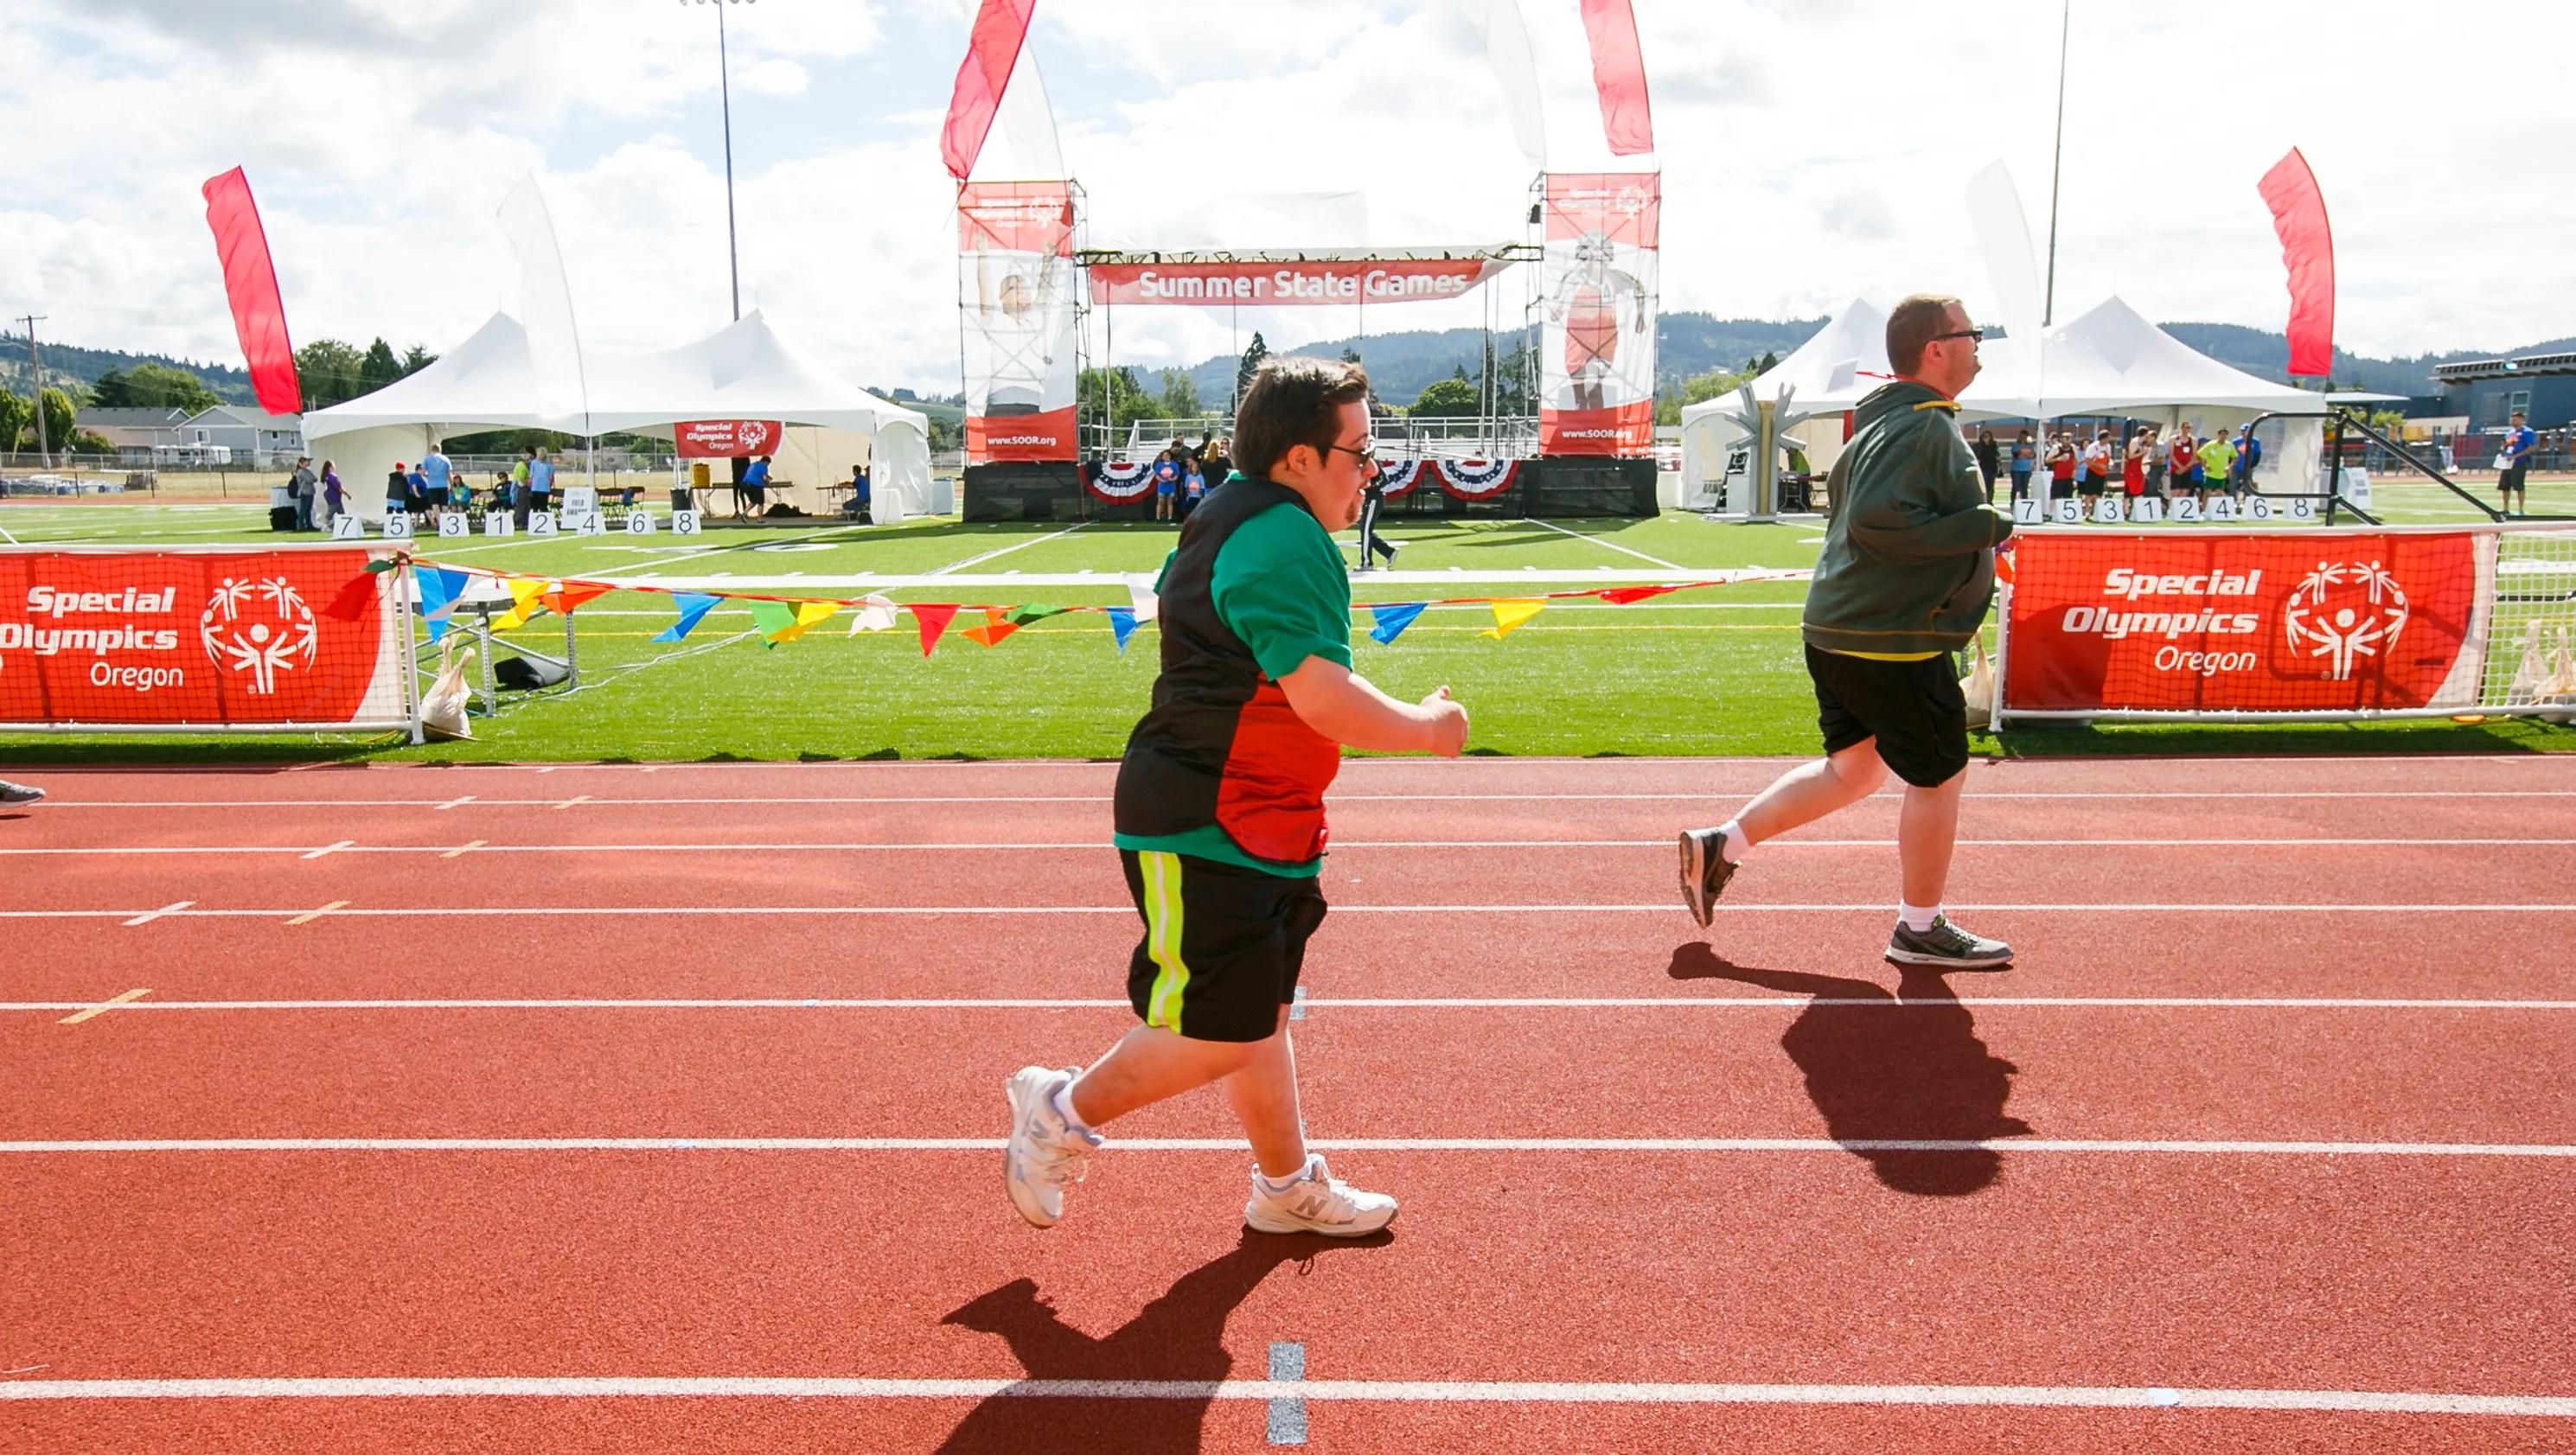 Special Clemson Olympics